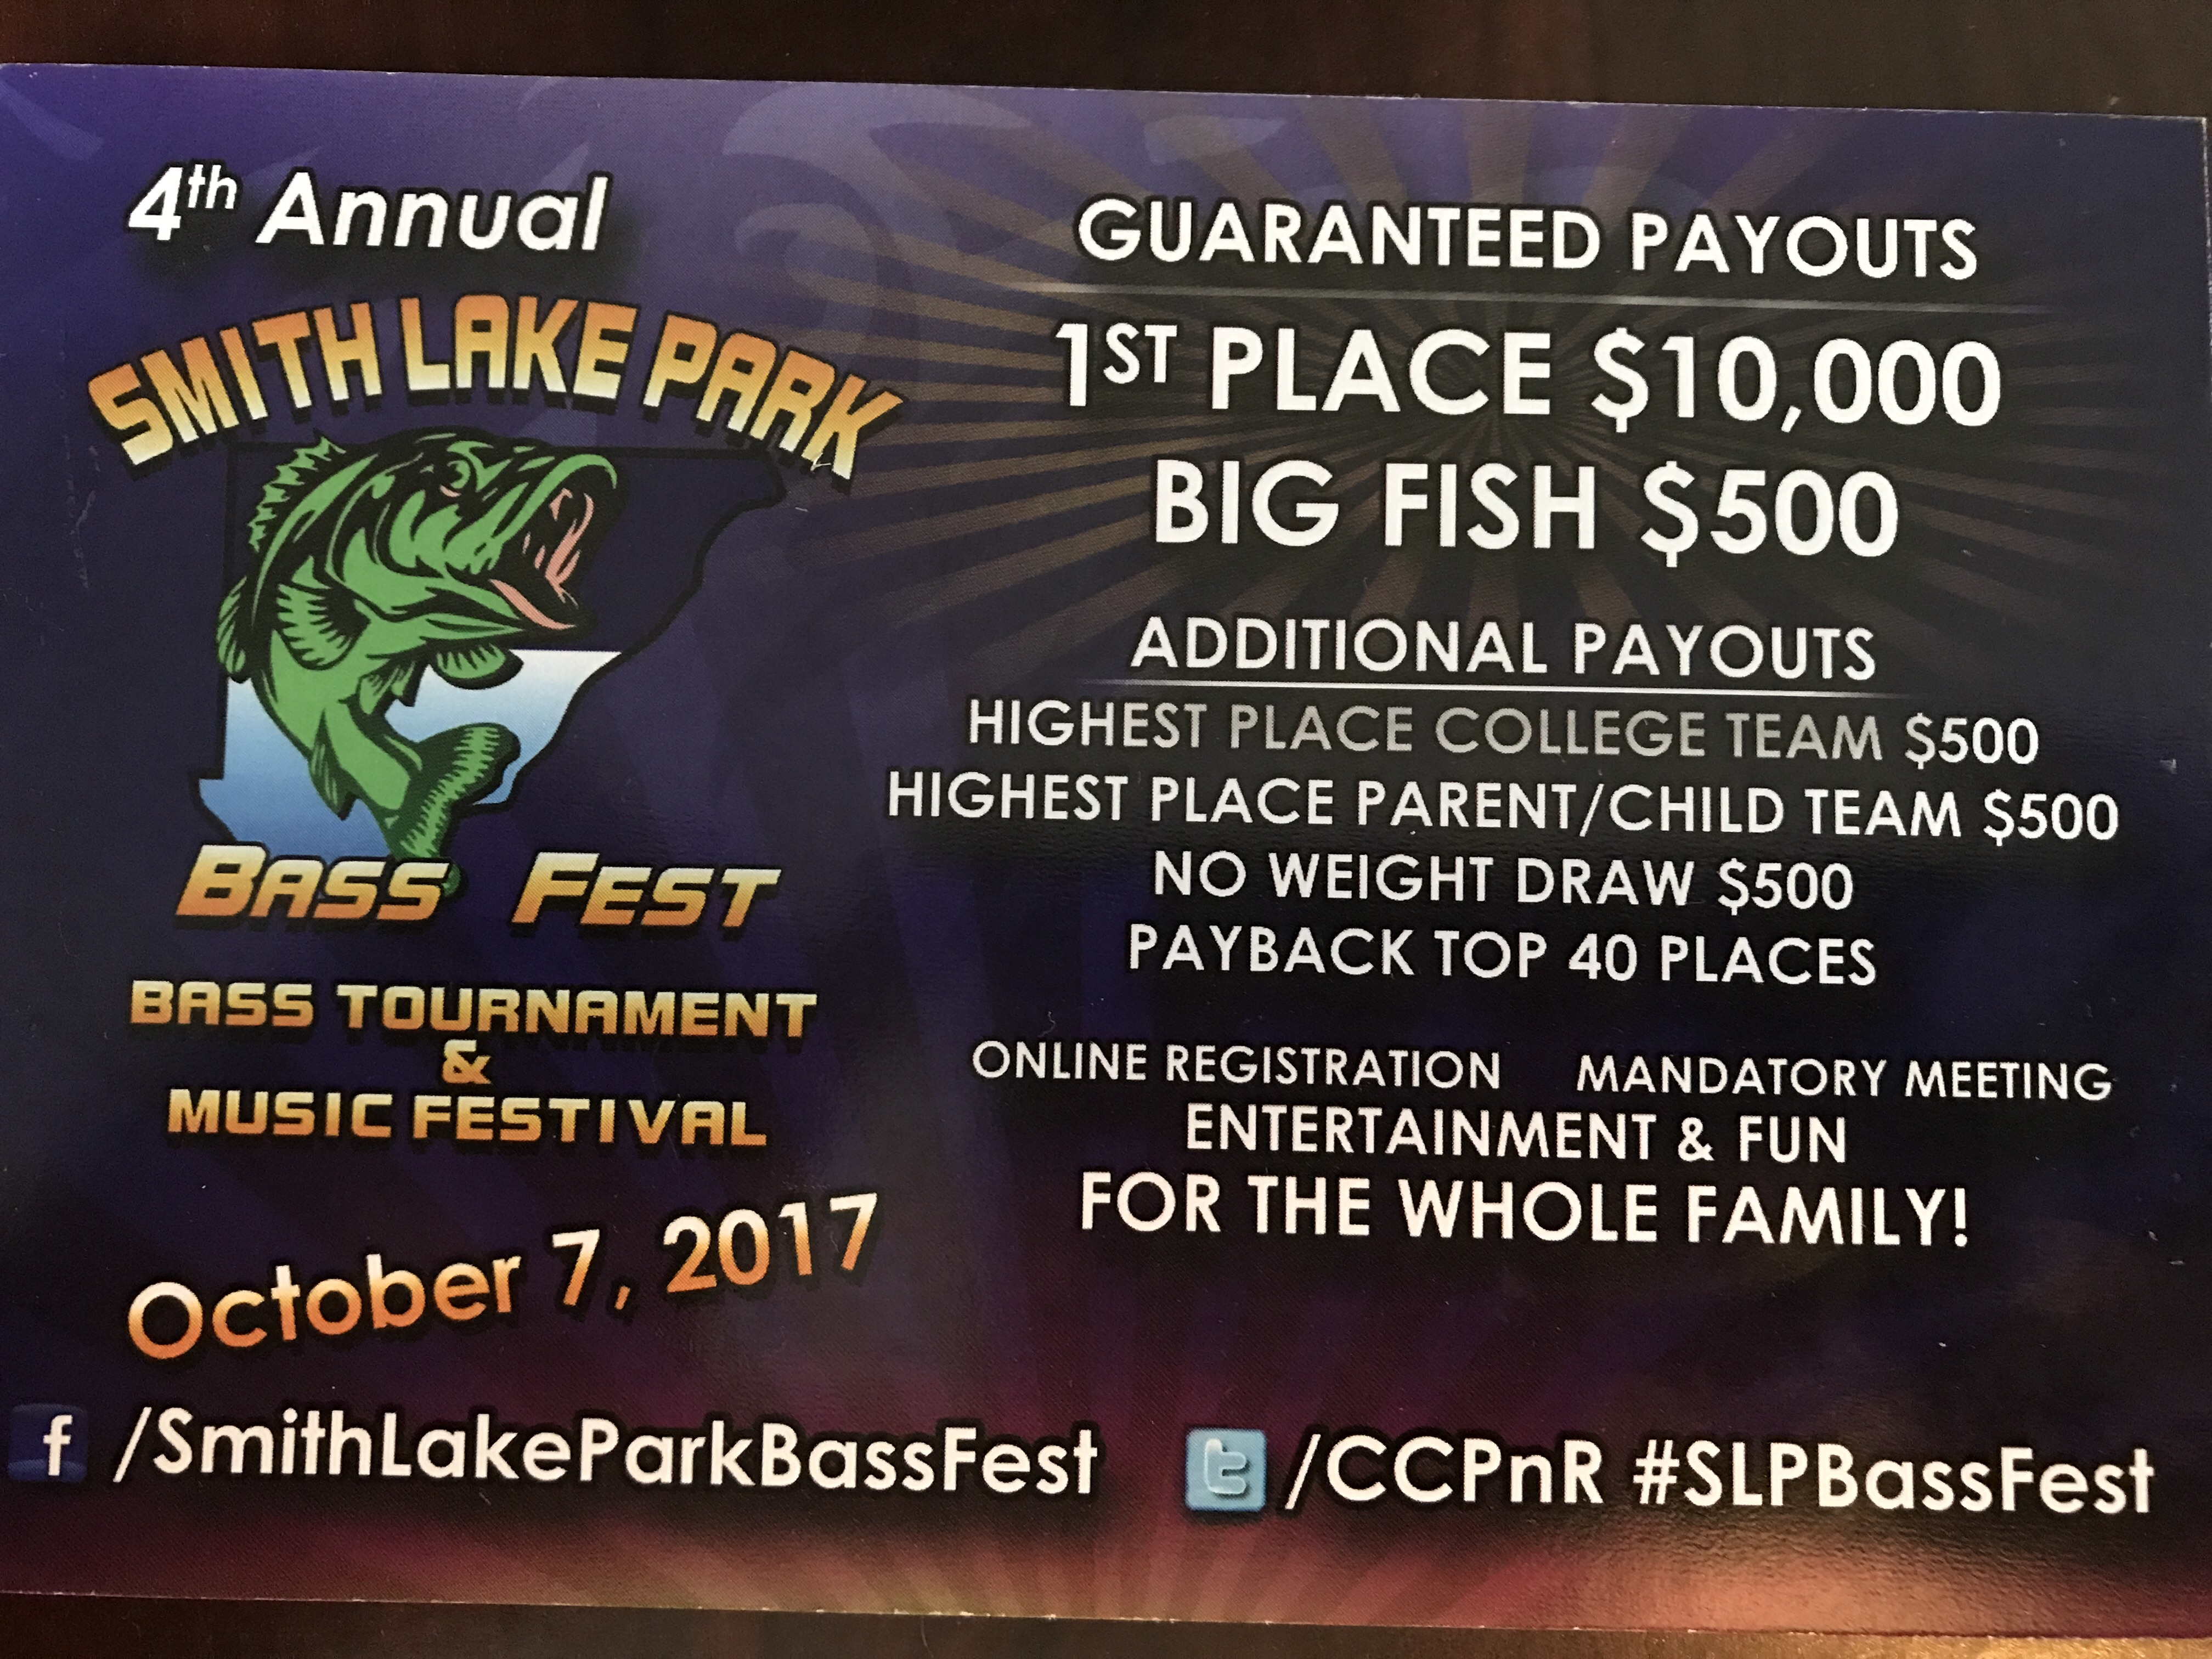 Smith Lake Park Bass Fest 2019